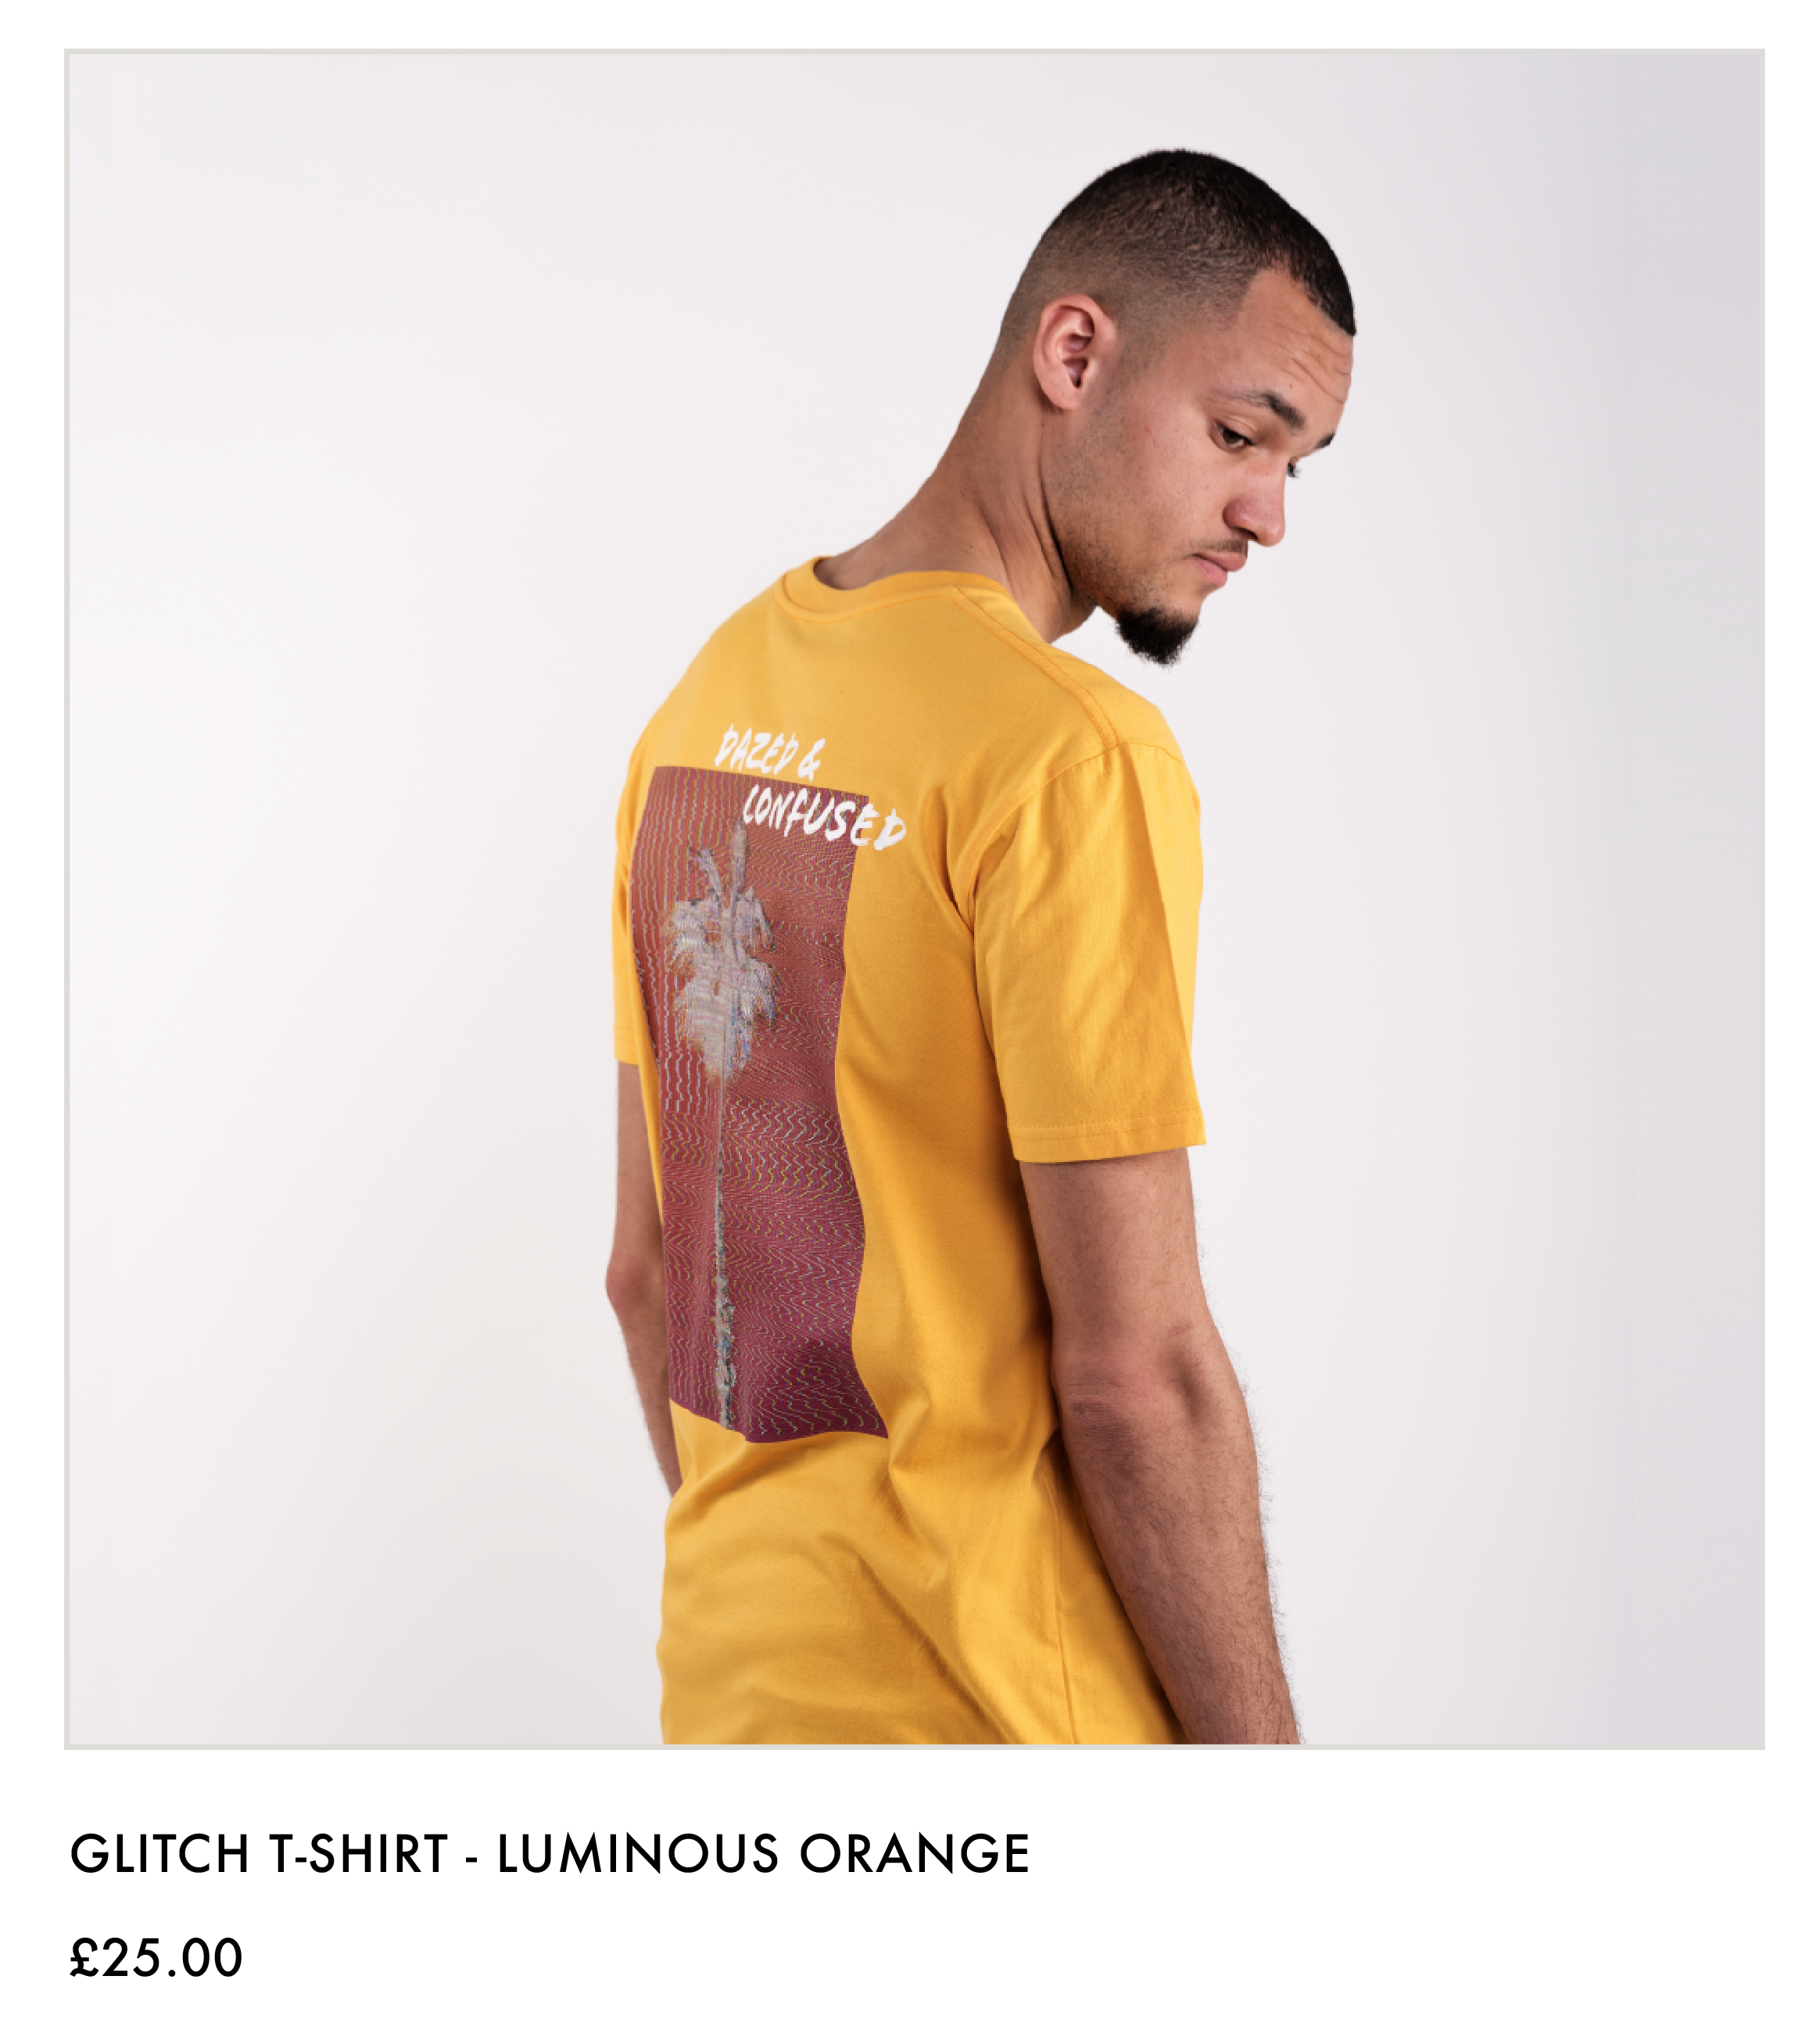 Glitch T-shirt - Luminous Orange